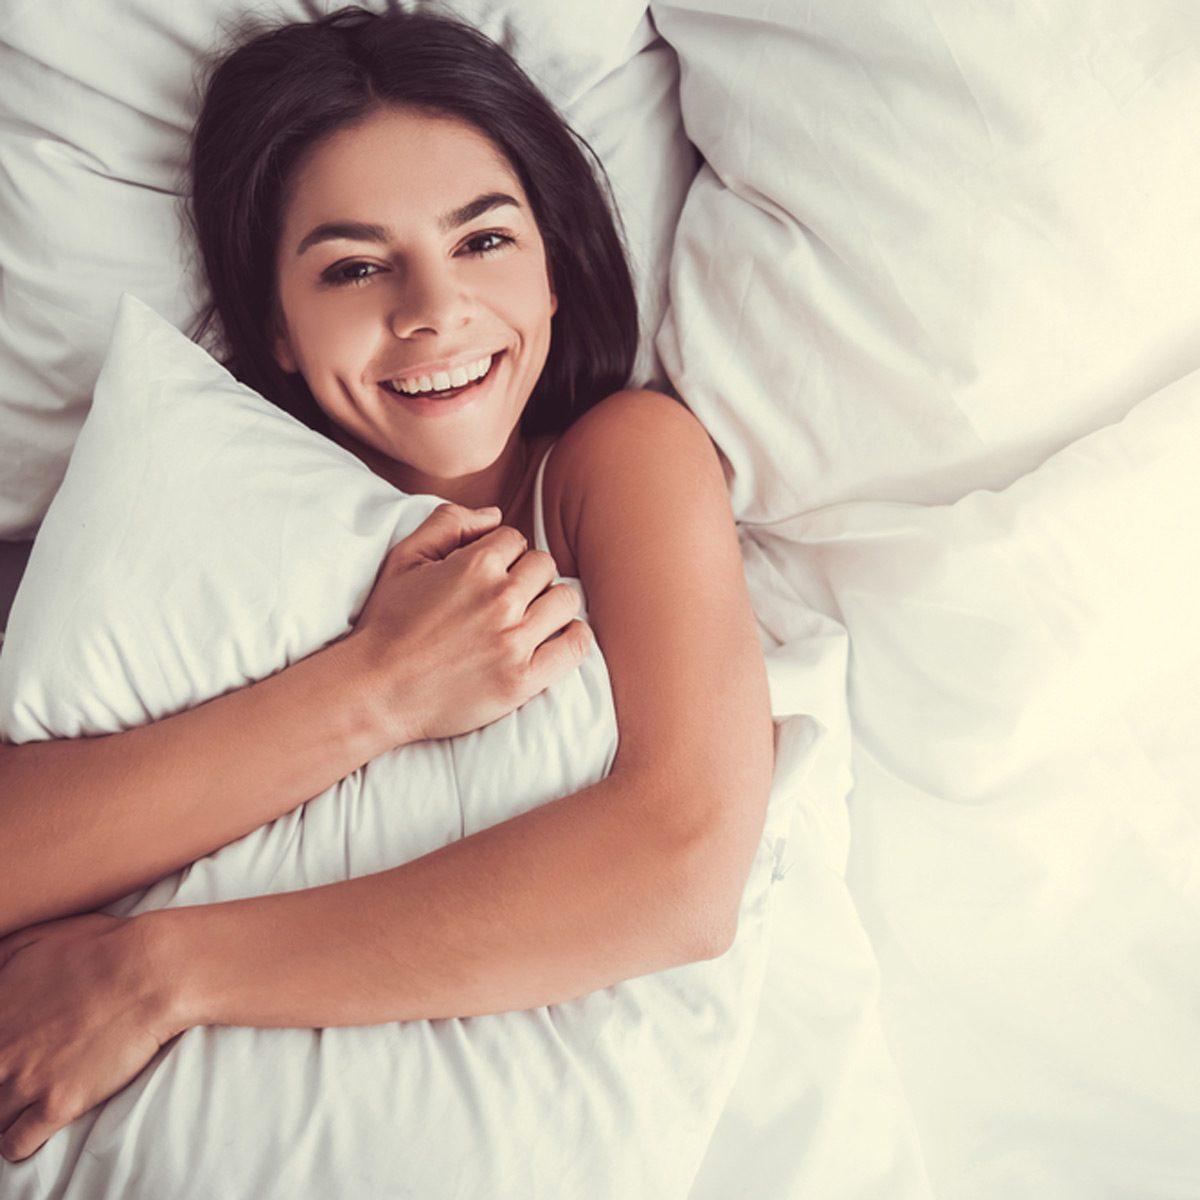 girl pillow